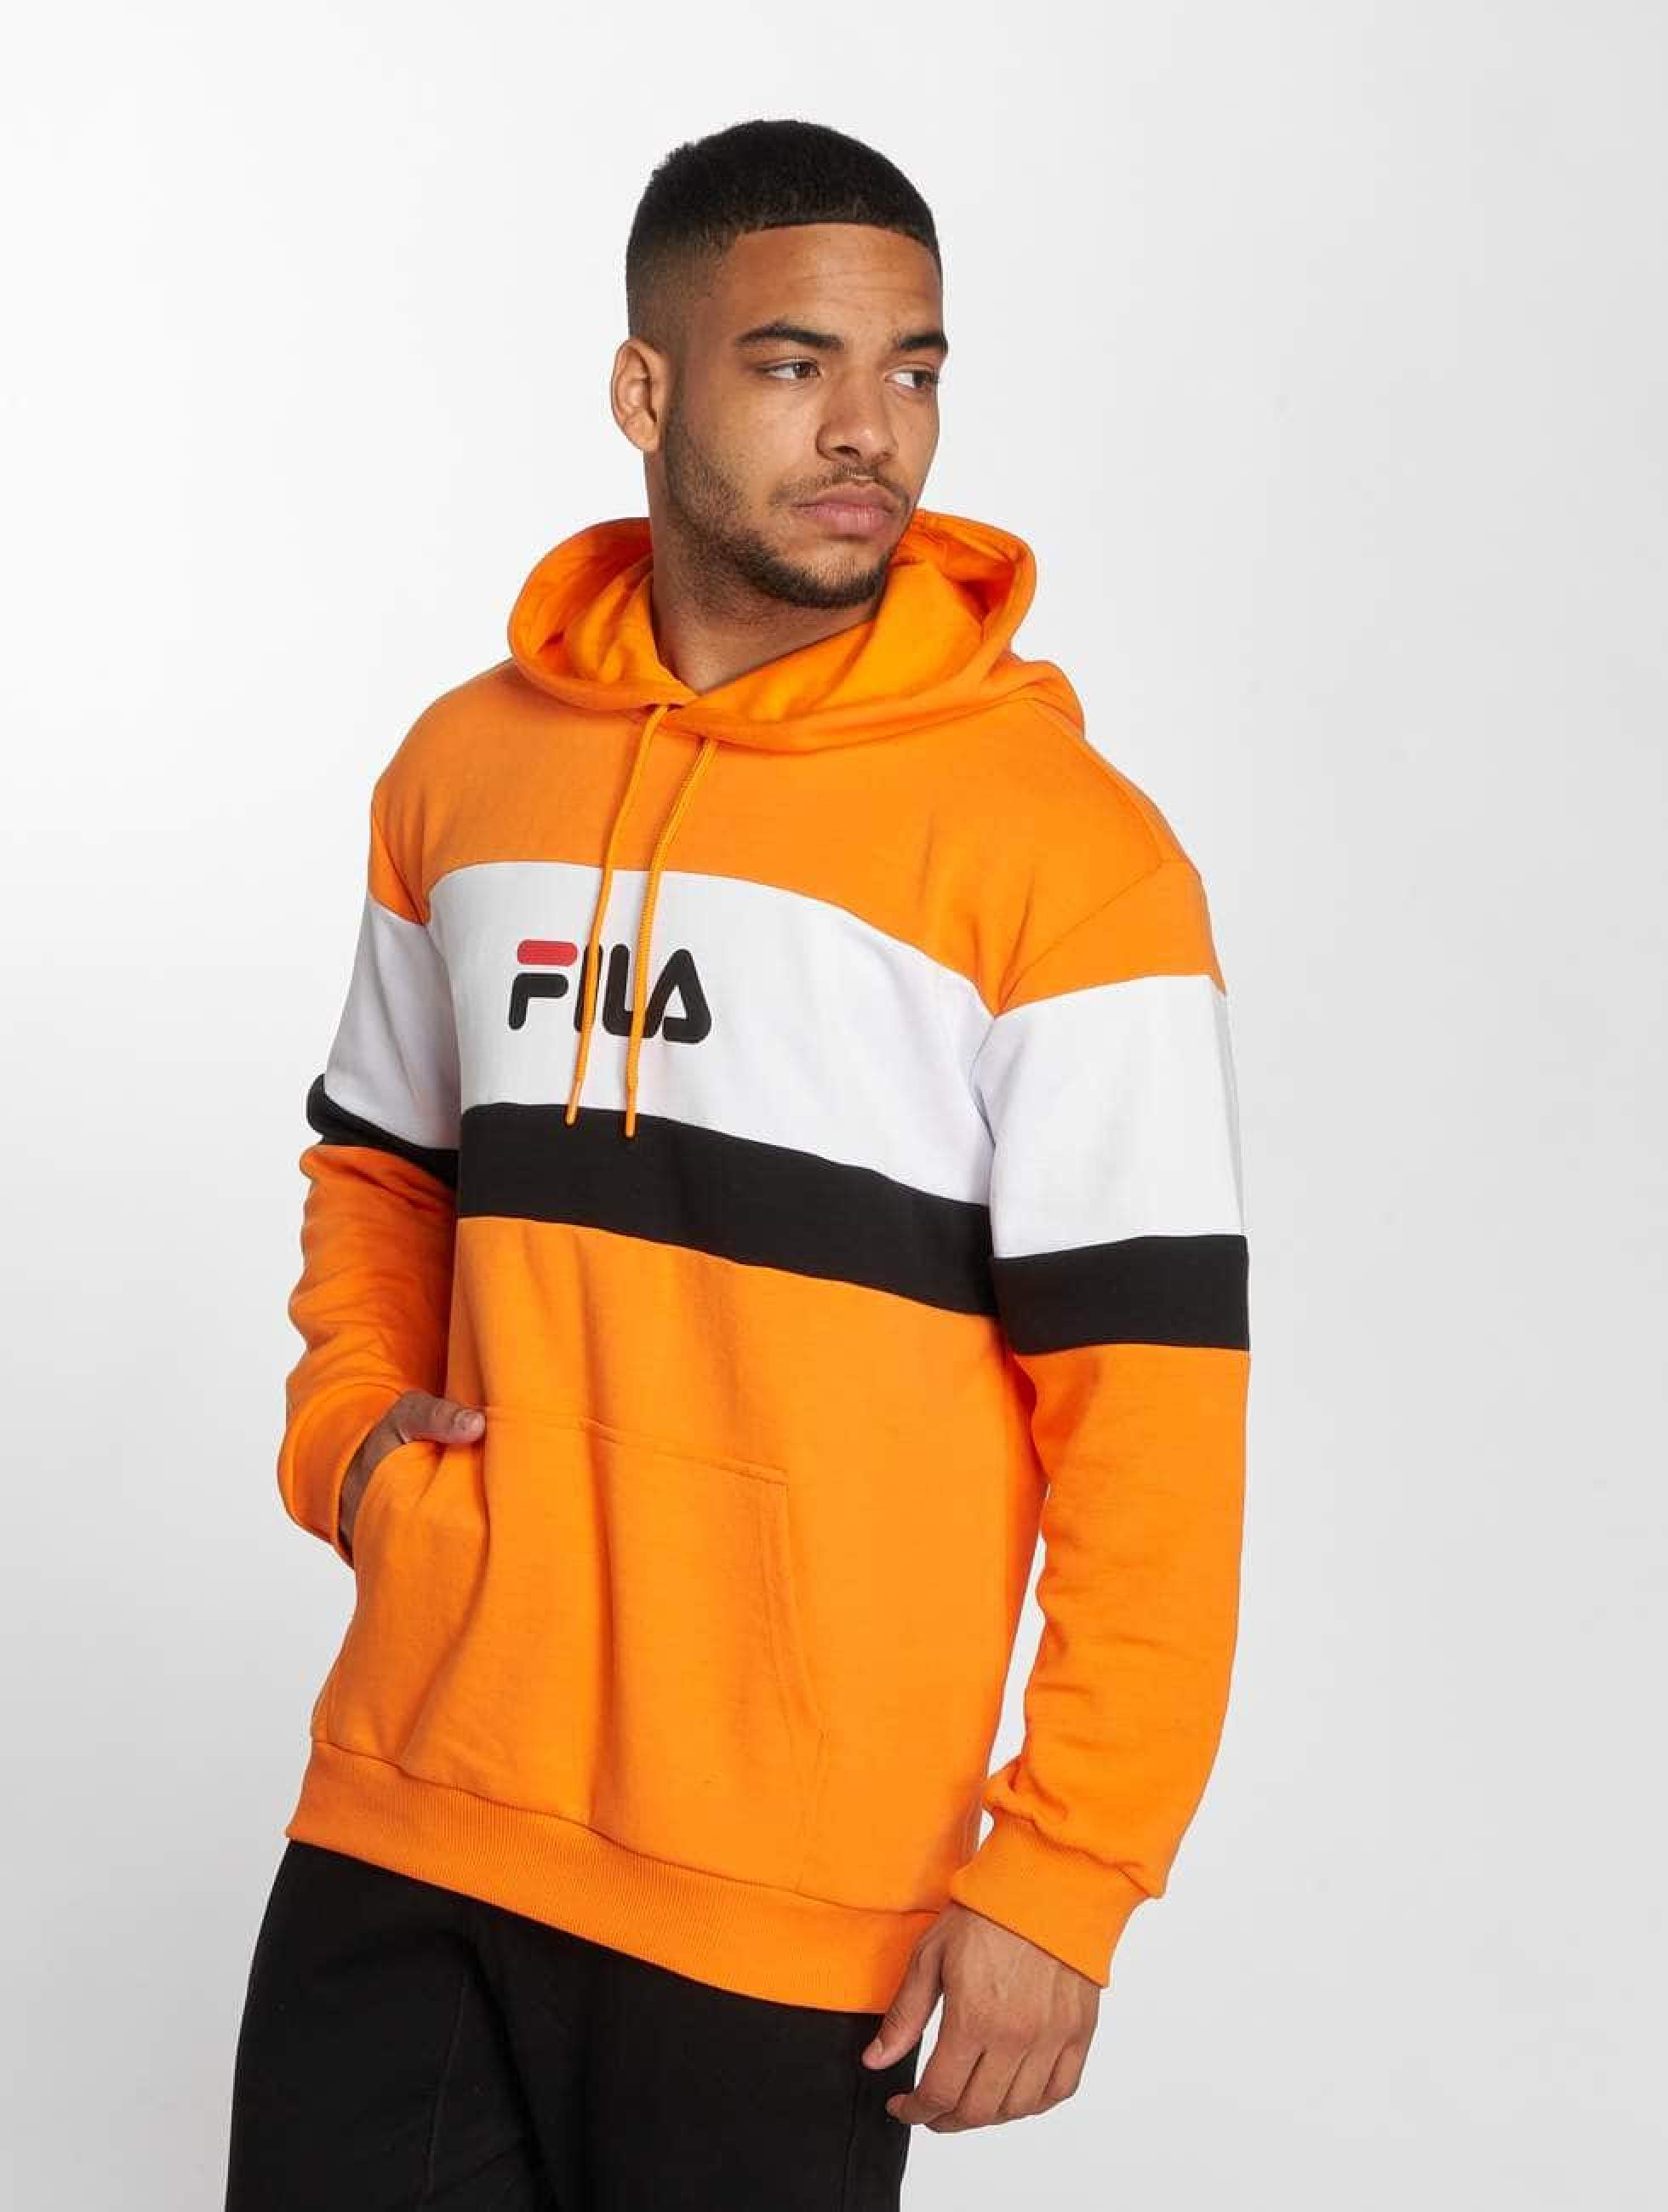 huge discount 01724 3d36c fila-sweat-capuche-orange-446977.jpg